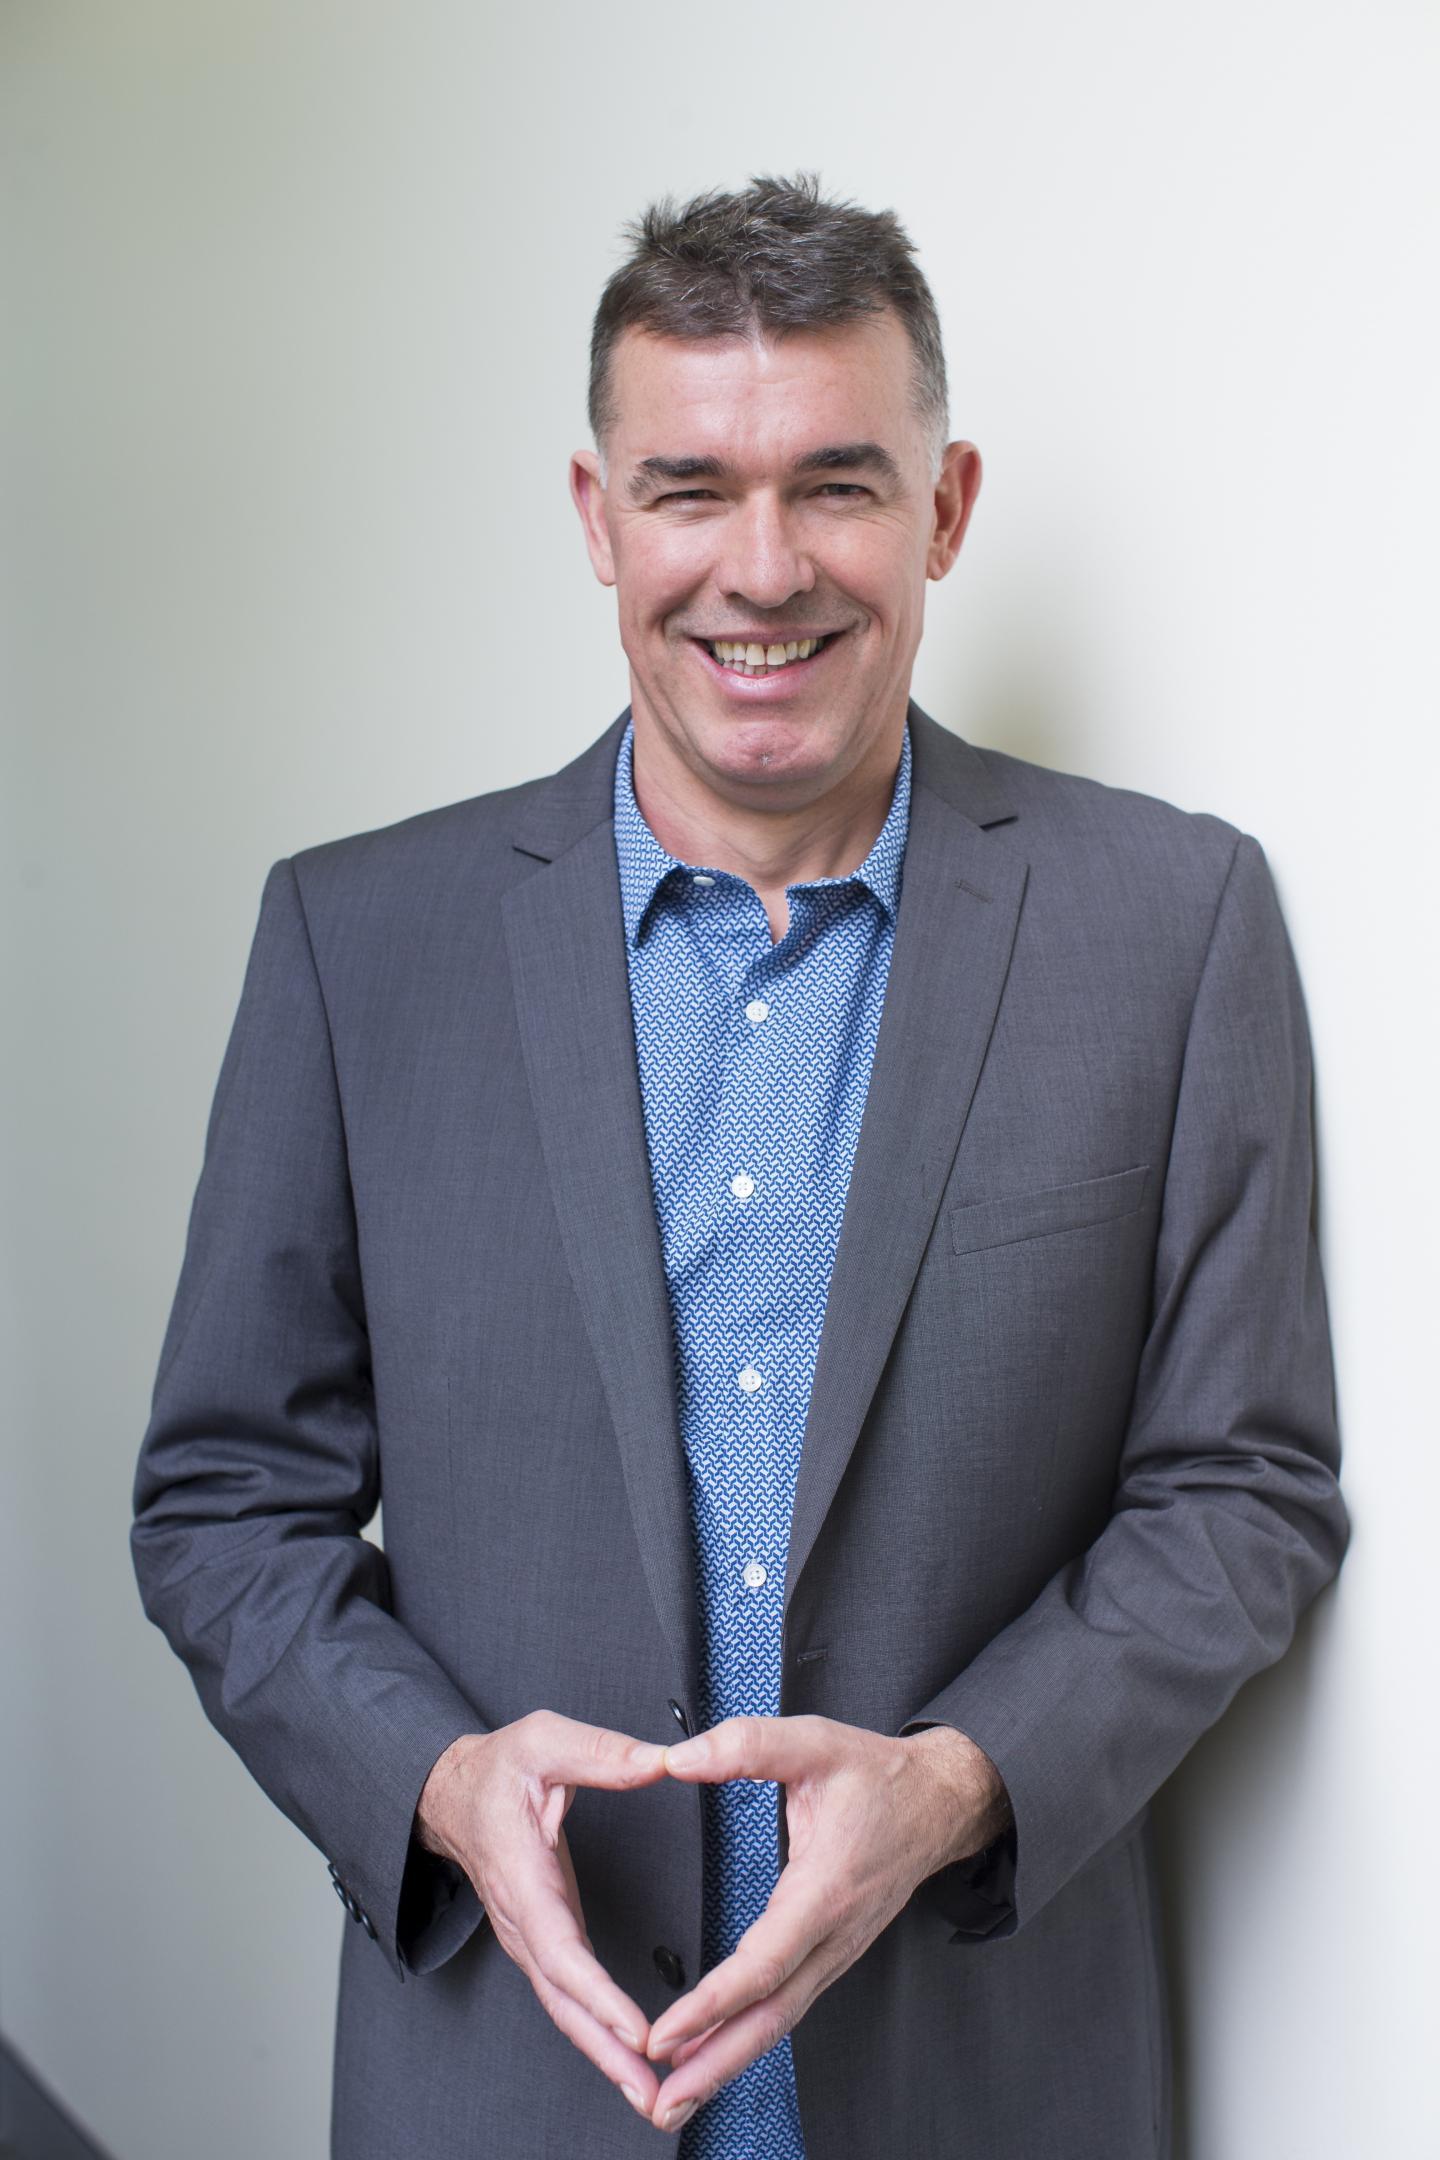 Iain McGregor, University of Sydney